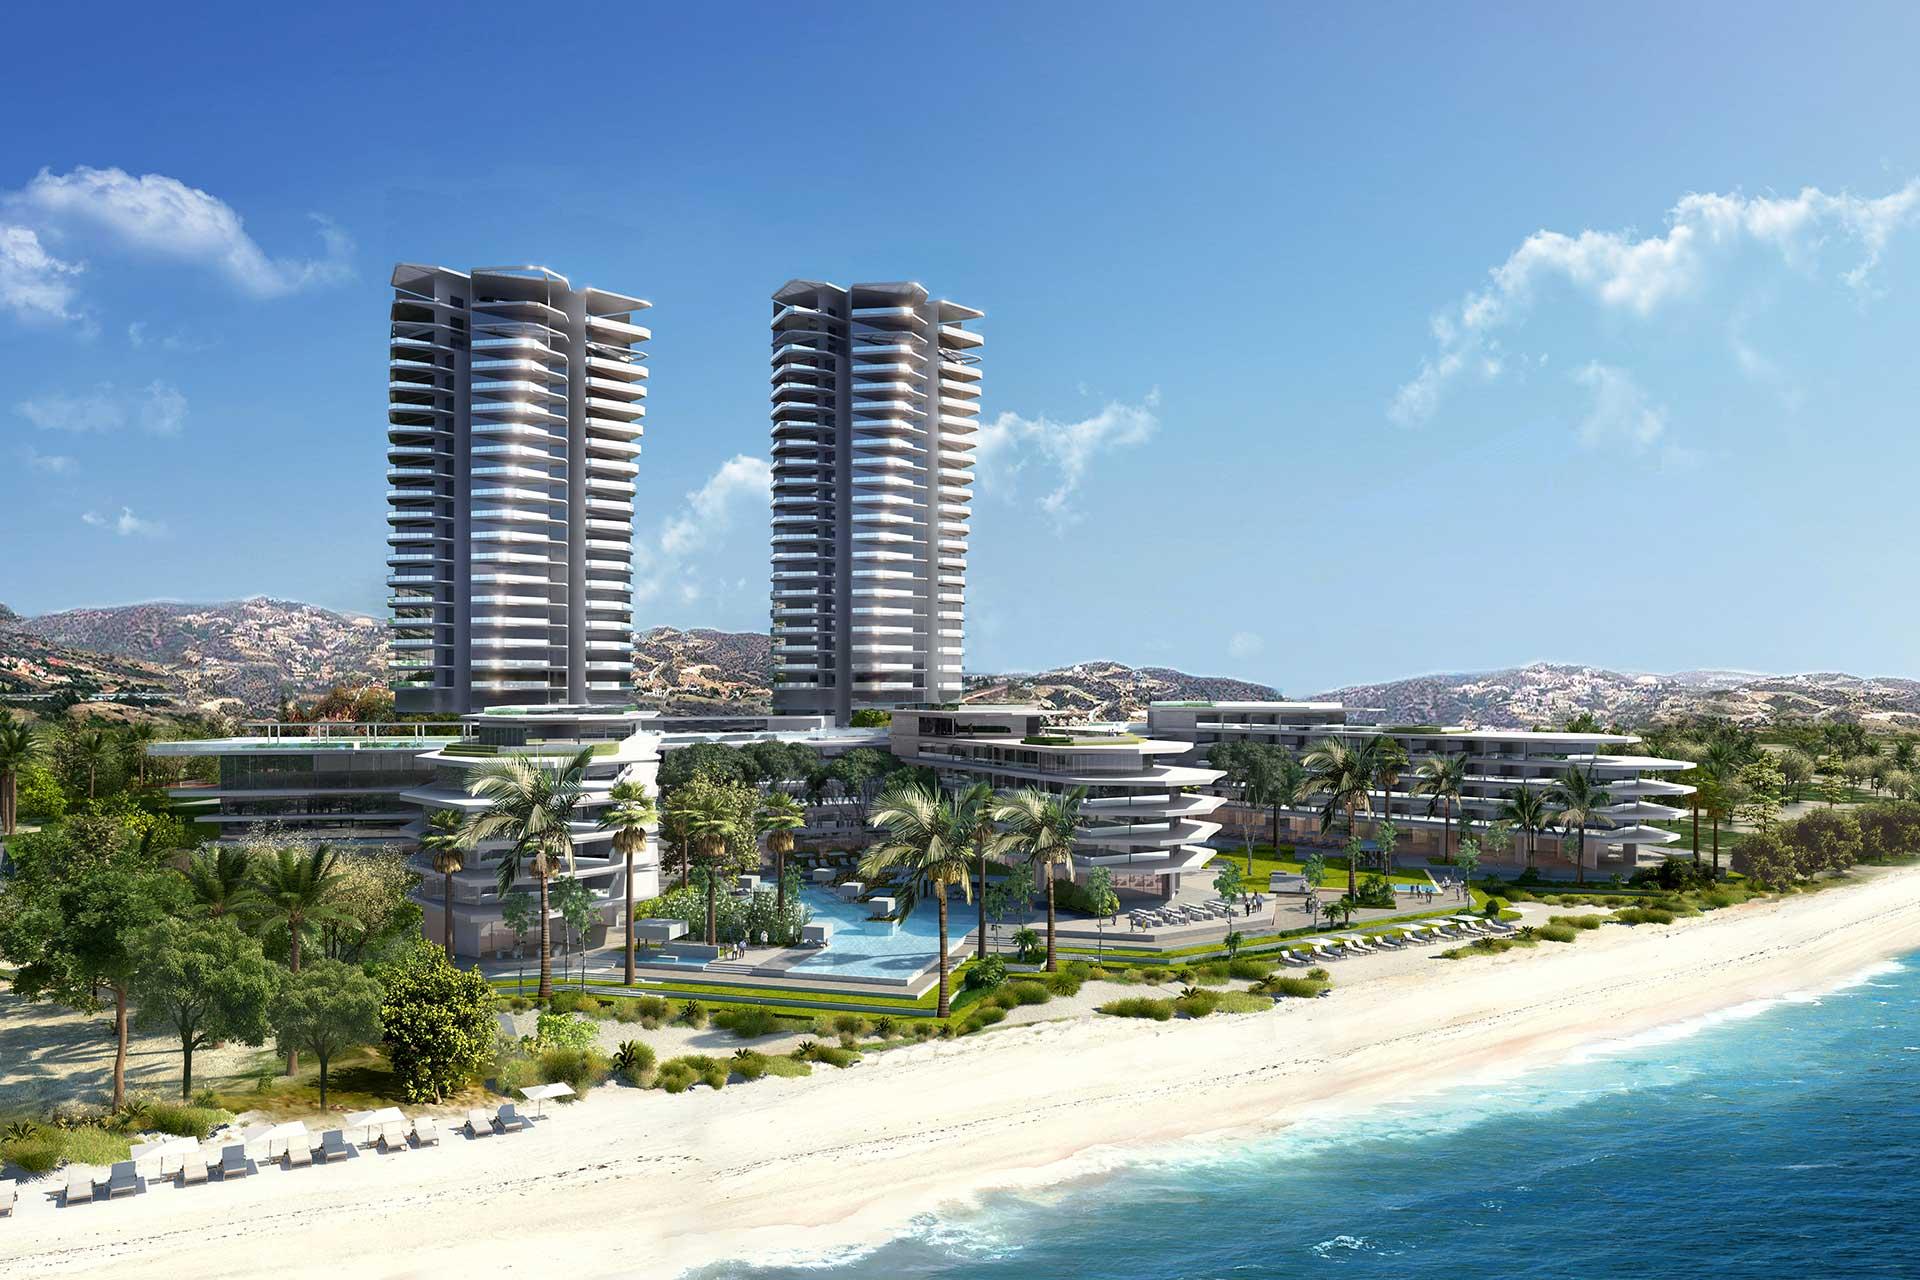 ELEMEC GBC - Projects, East Coastal